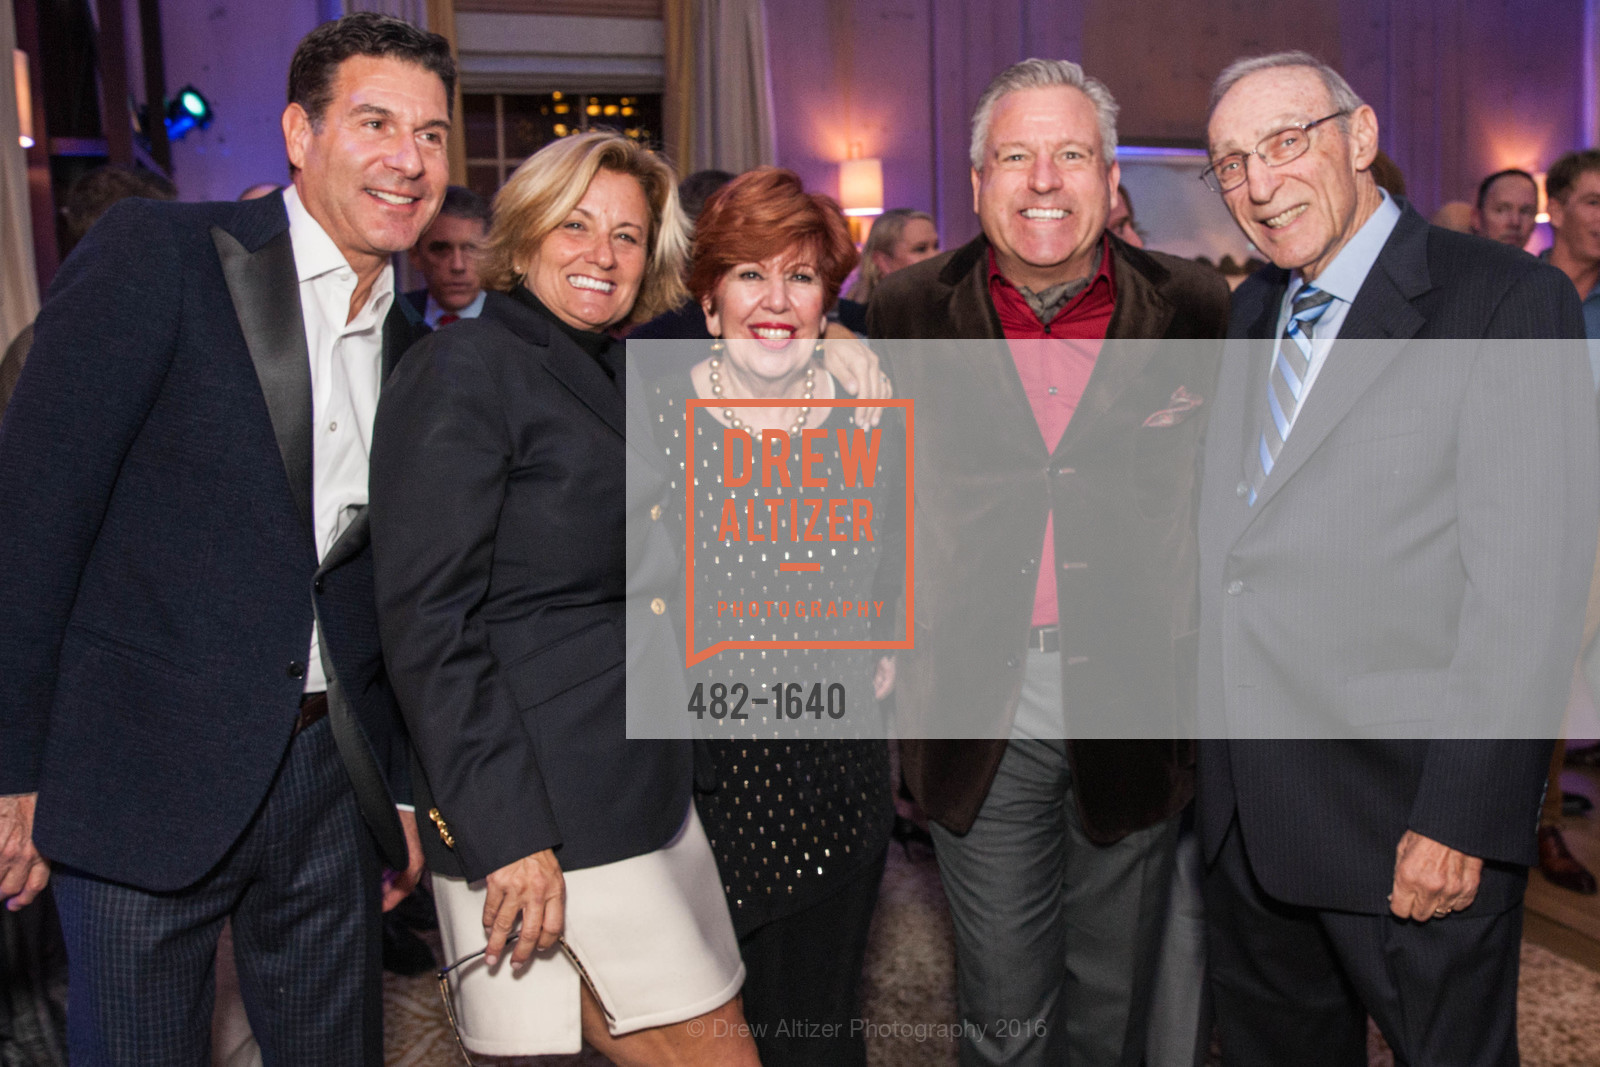 Glenn Risso, Gina Champion, Elaine Schwartz, Burt Schwartz, Gregg Lynn and Glenn Risso's Engagement Party, Farimont Hotel, Penthouse. San Francisco, California, December 7th, 2016